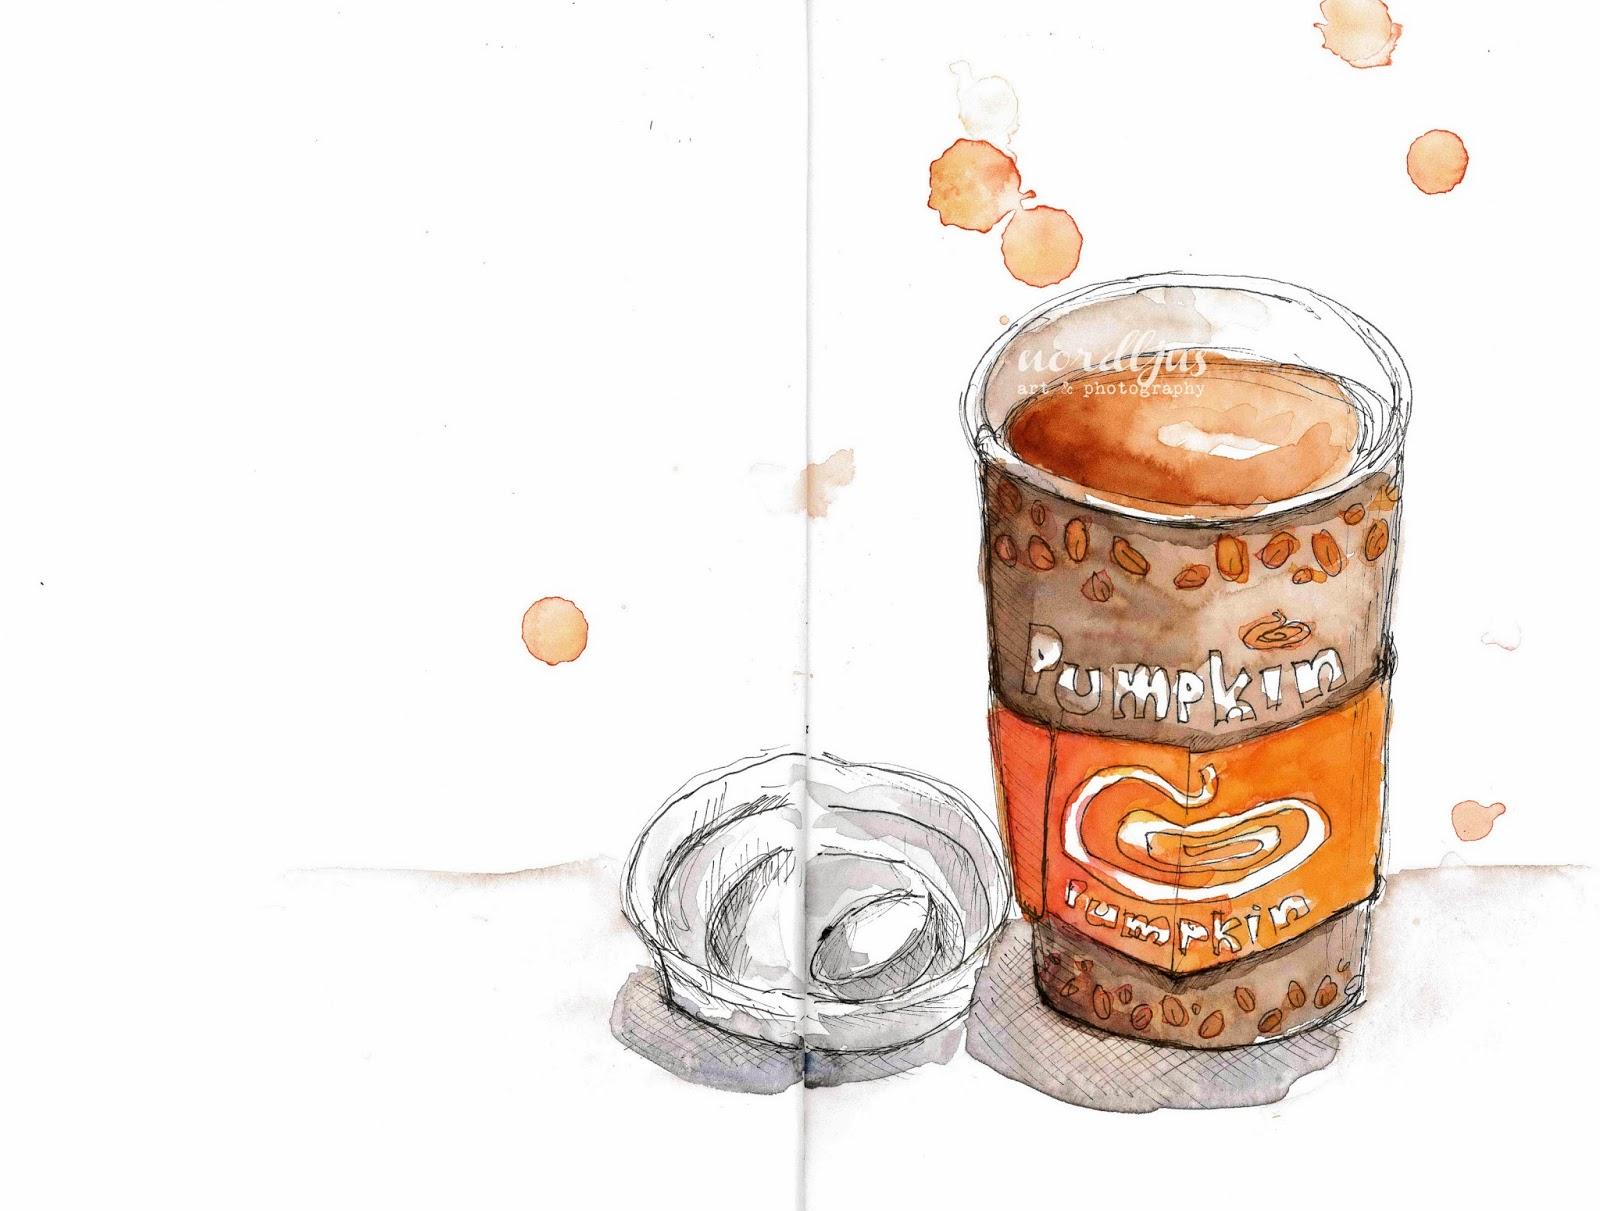 Nordljus pumpkin tea sketch